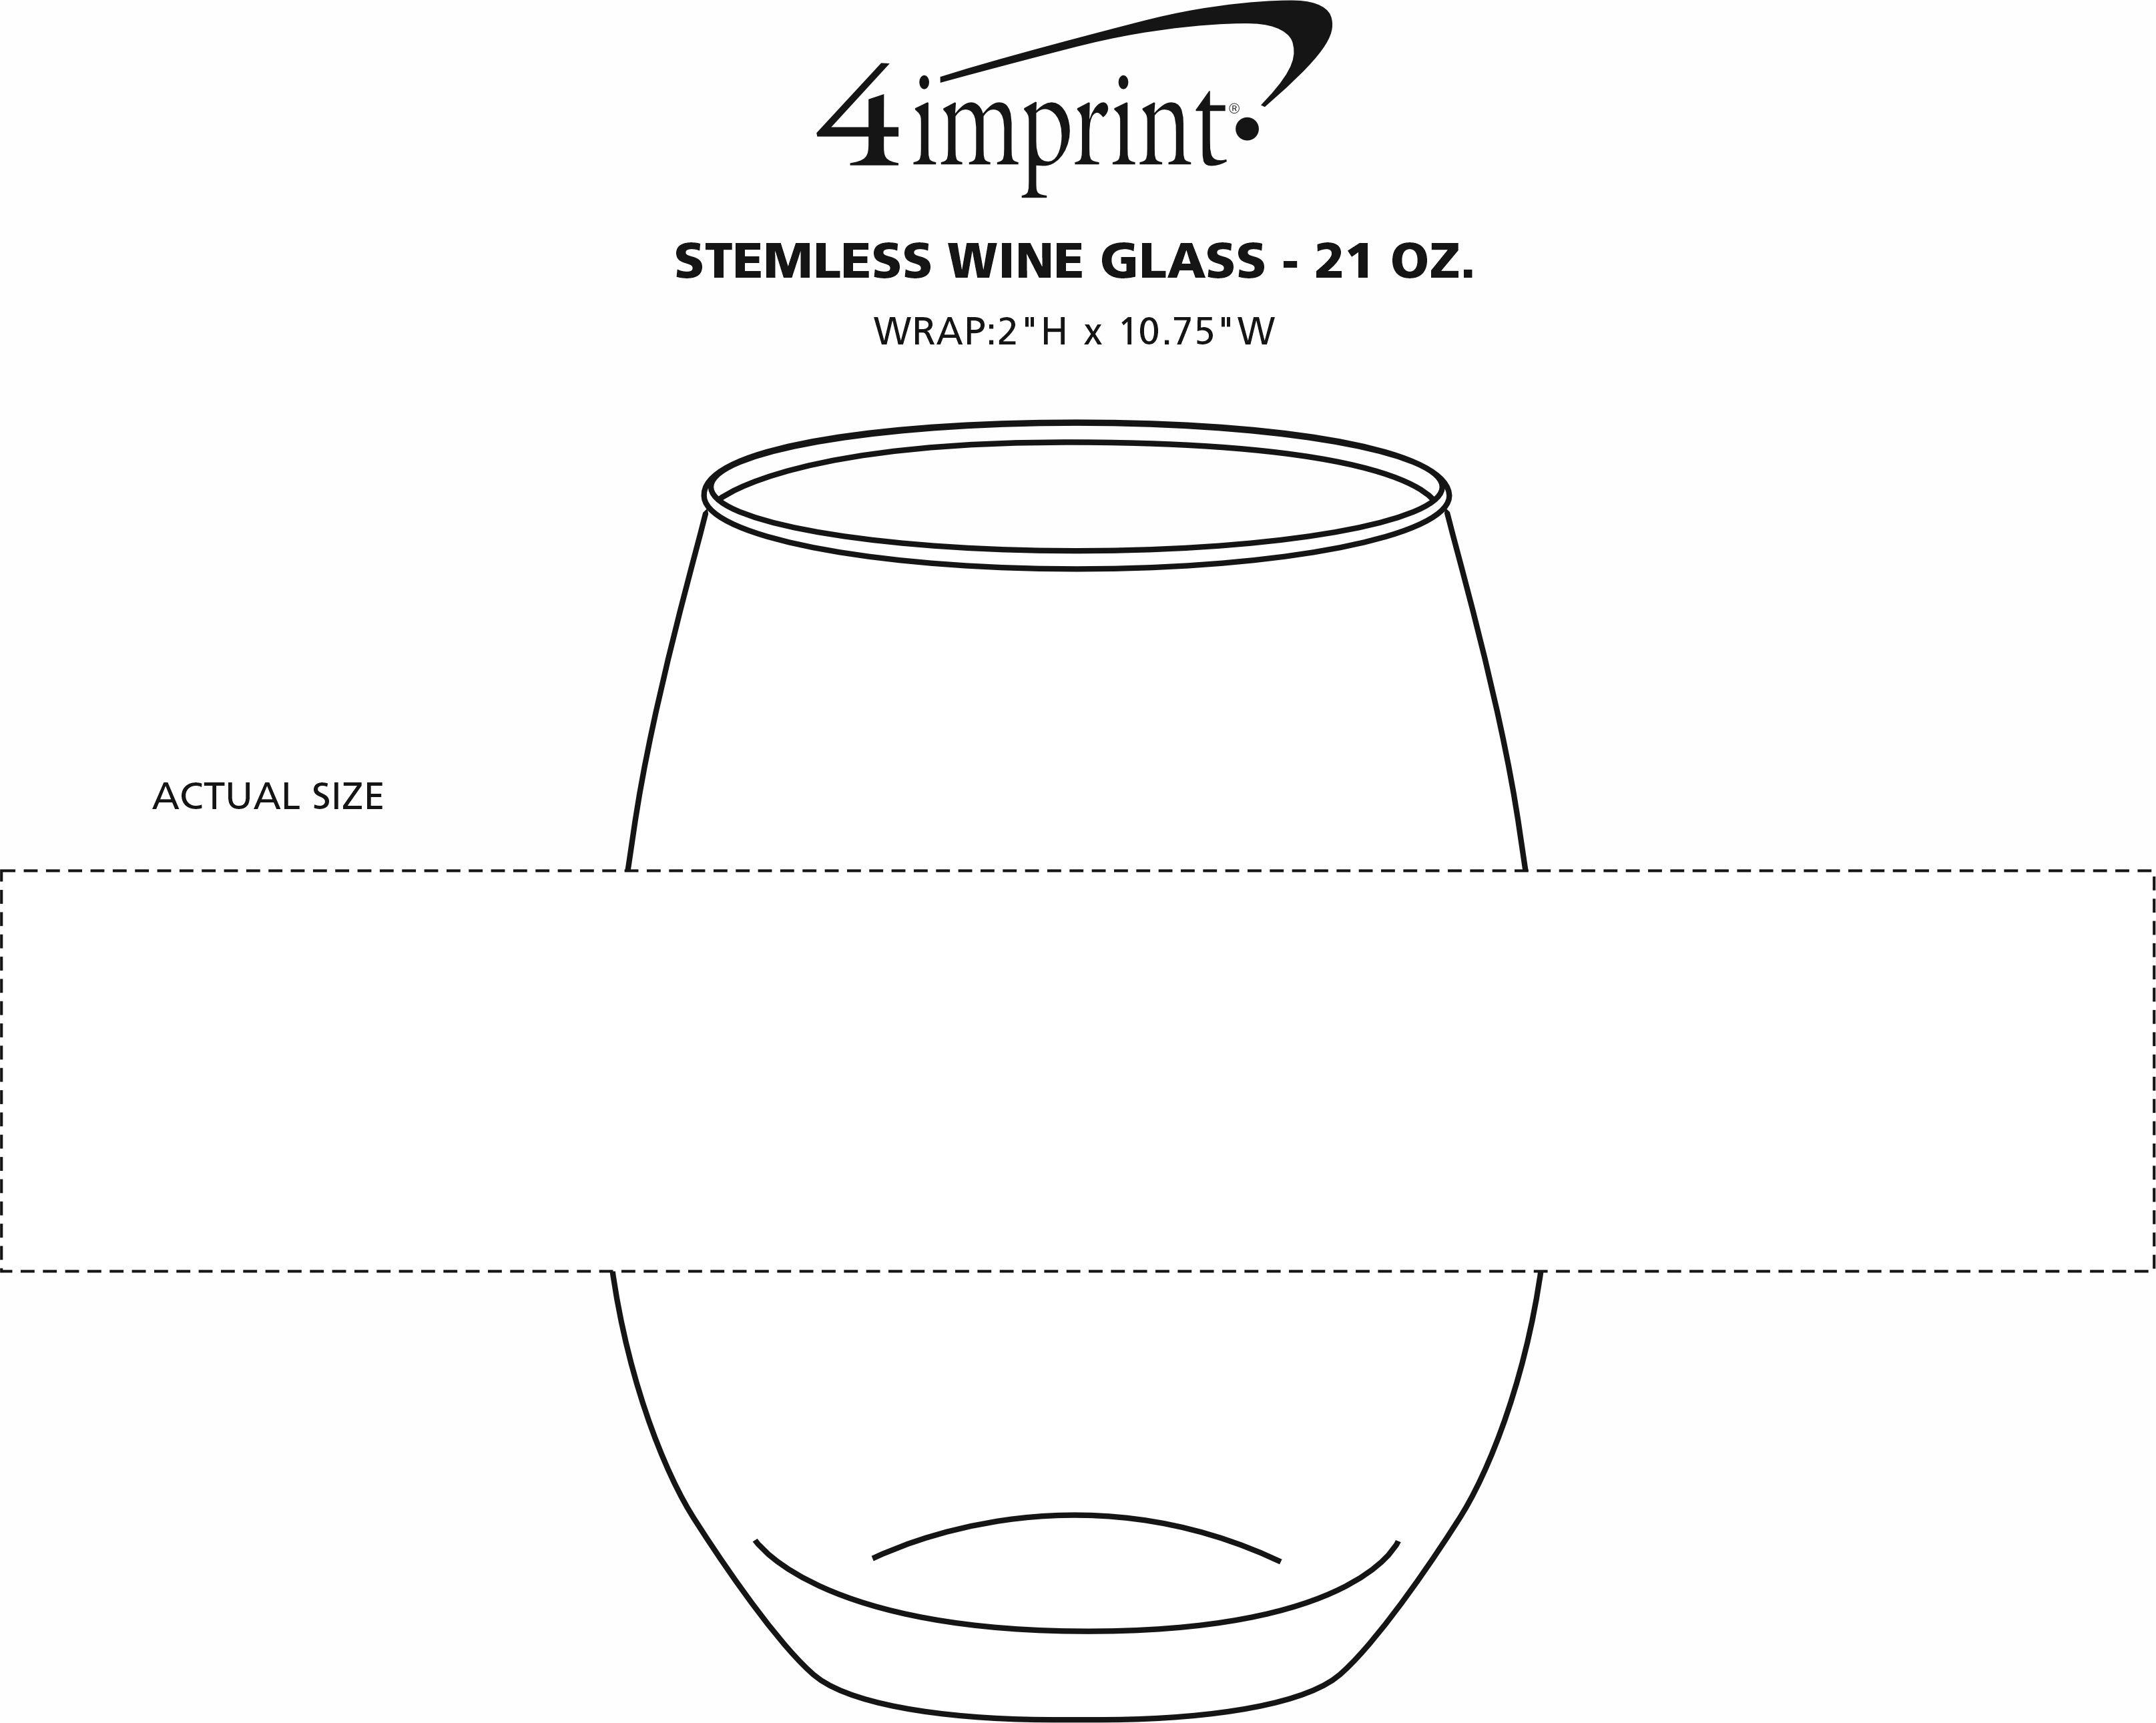 Imprint Area of Stemless Wine Glass - 21 oz.